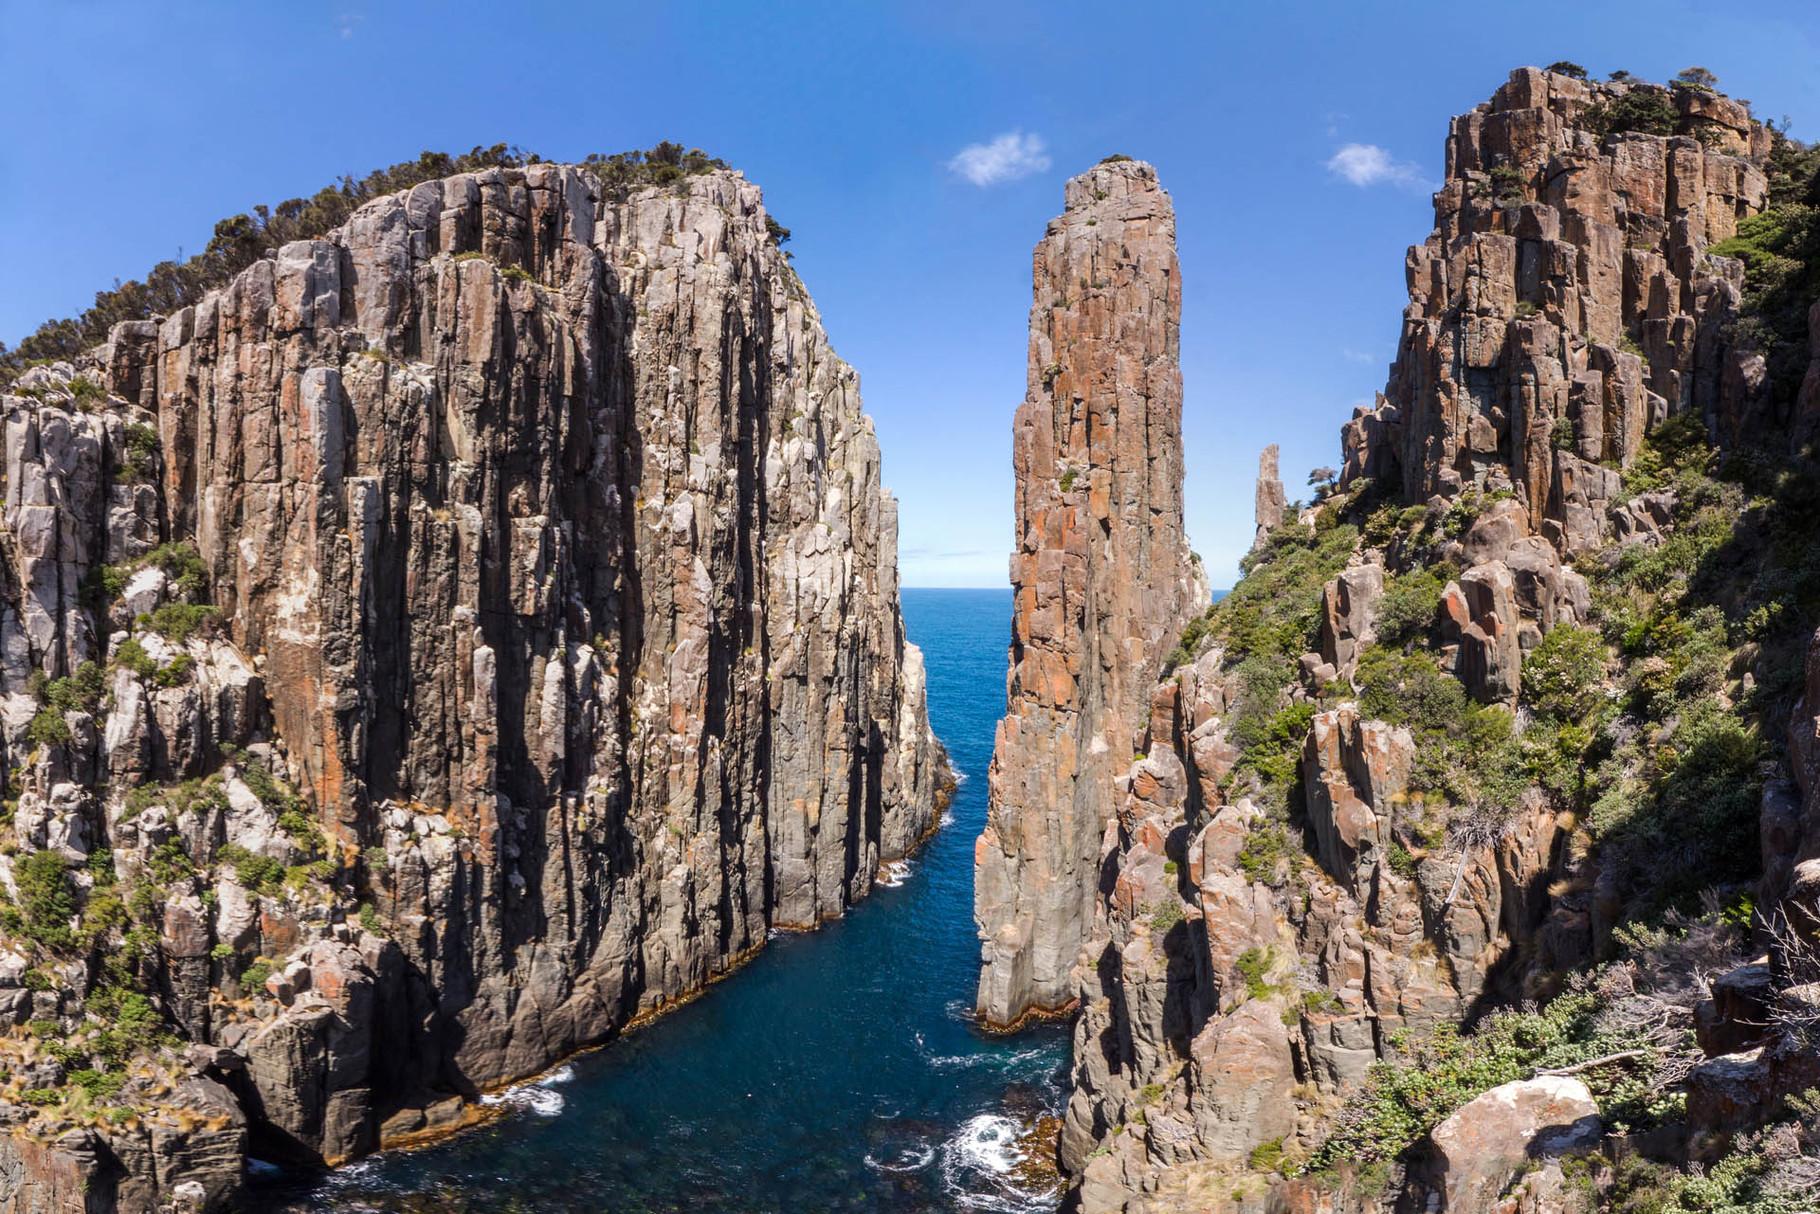 Candlestick and Totempol at Cape Hauy, Tasmania [Australia, 2014]